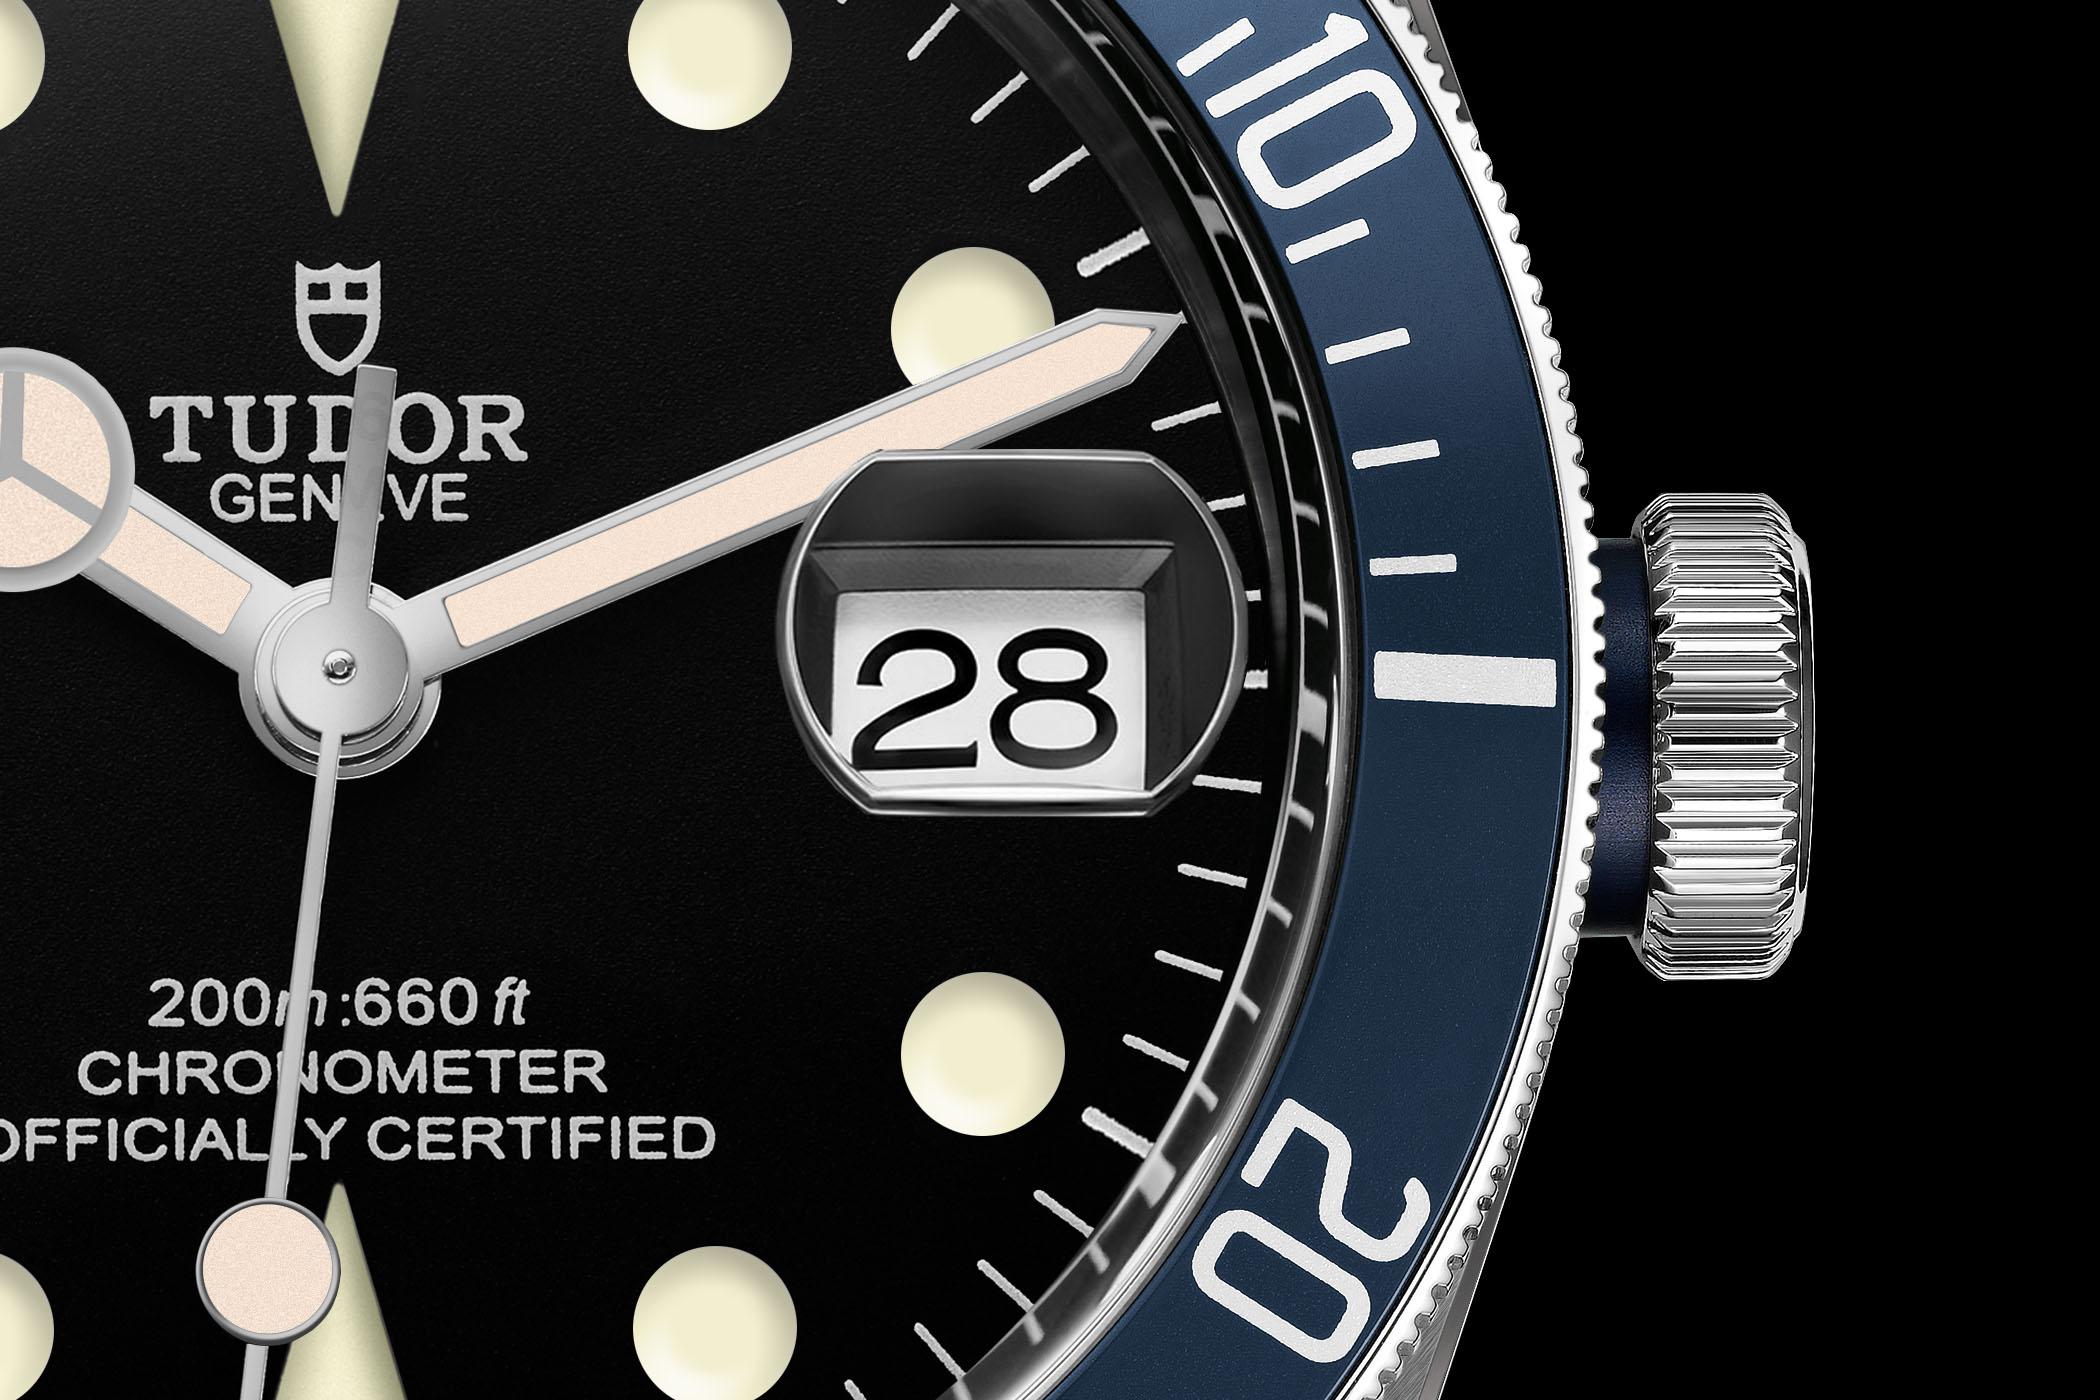 2019 Tudor OysterDate Submariner revival - Tudor Baselworld 2019 - Tudor 2019 Predictions - 12